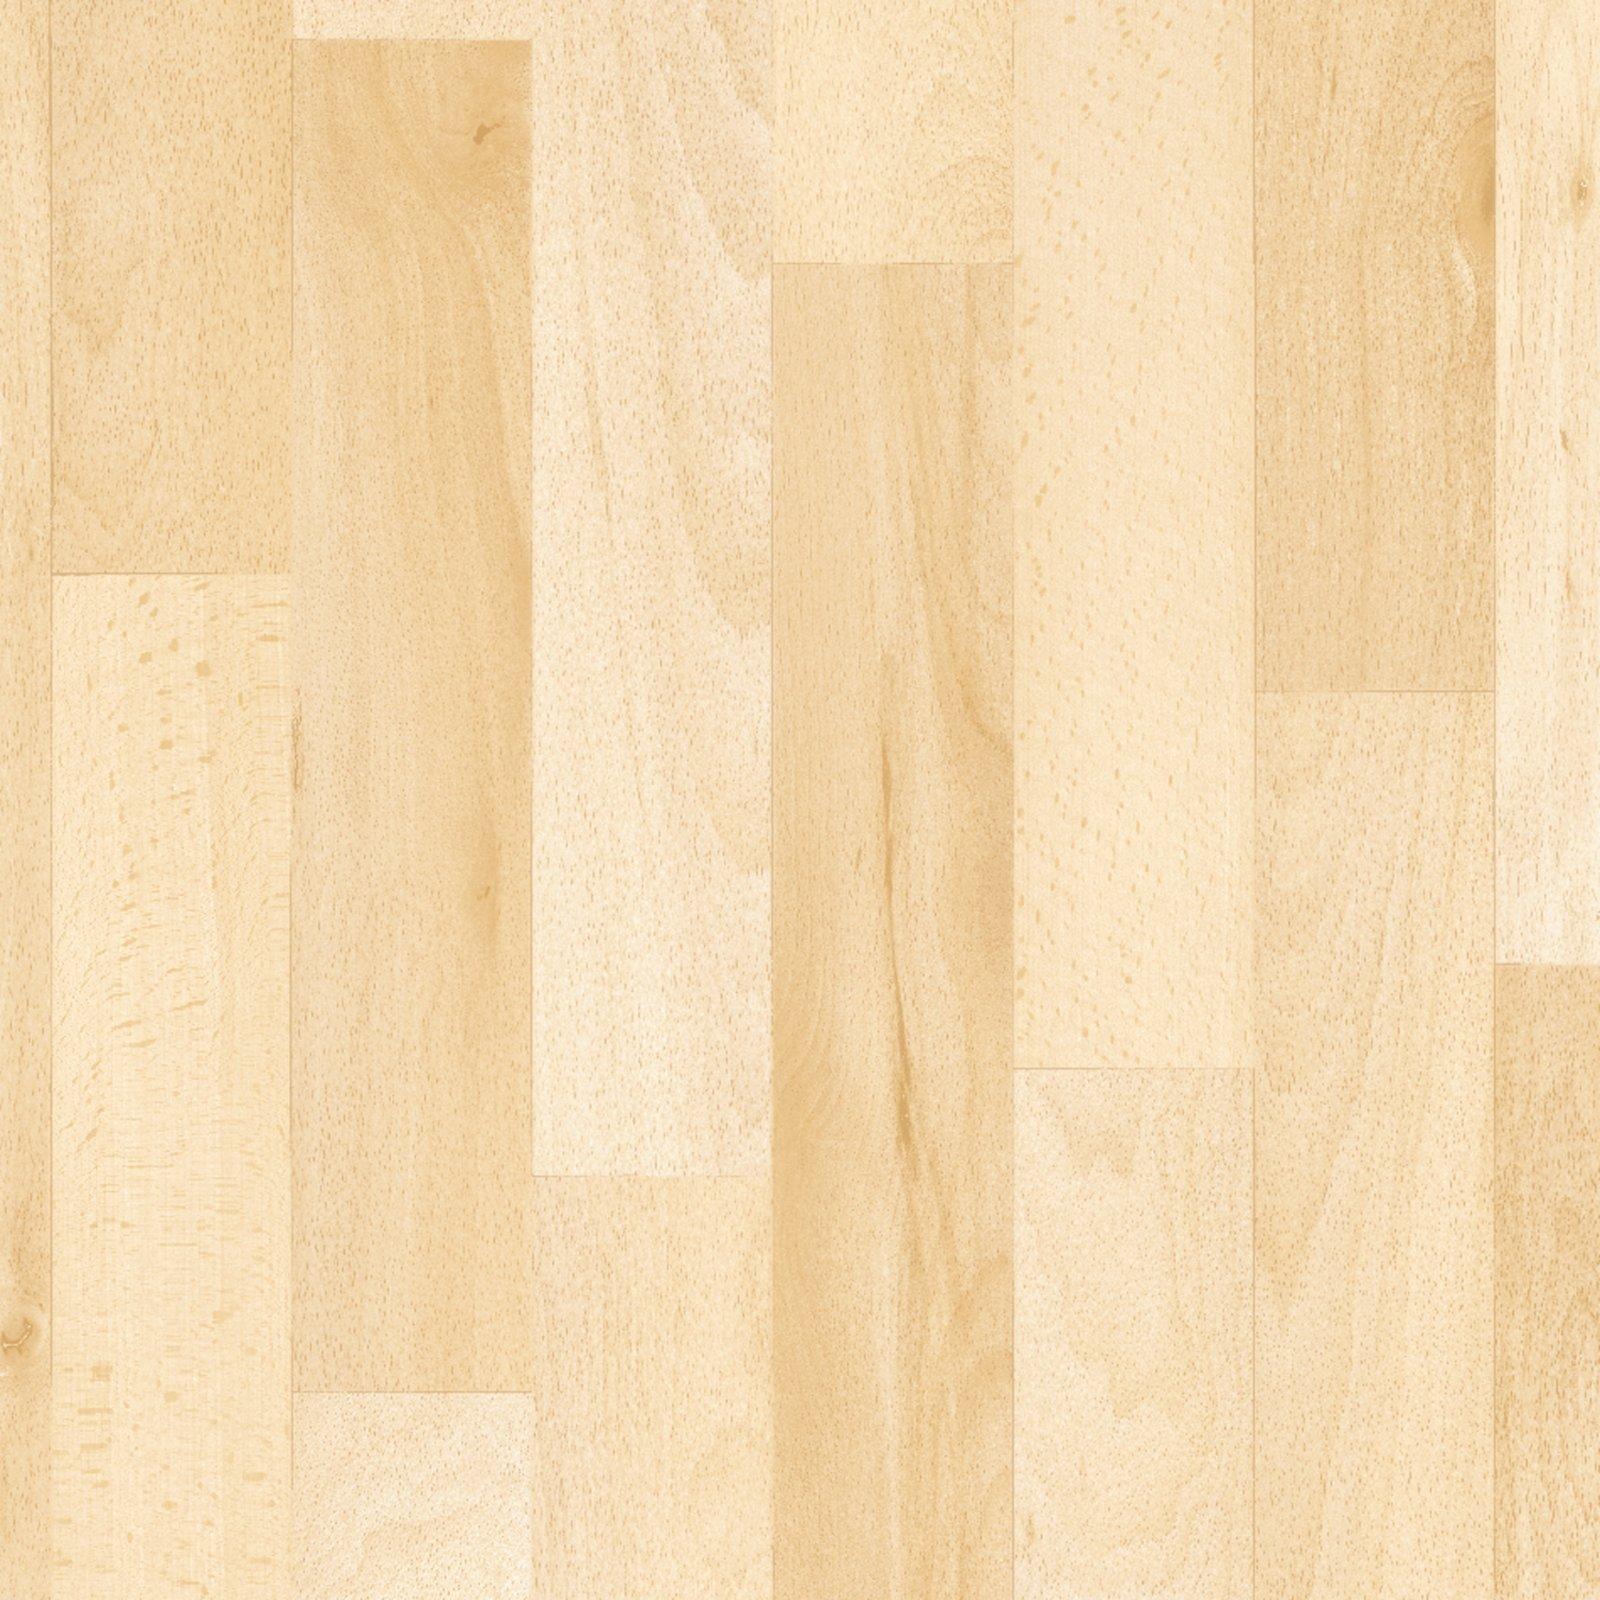 pvc bodenbelag prag parkett st bchen apfel 4 meter. Black Bedroom Furniture Sets. Home Design Ideas